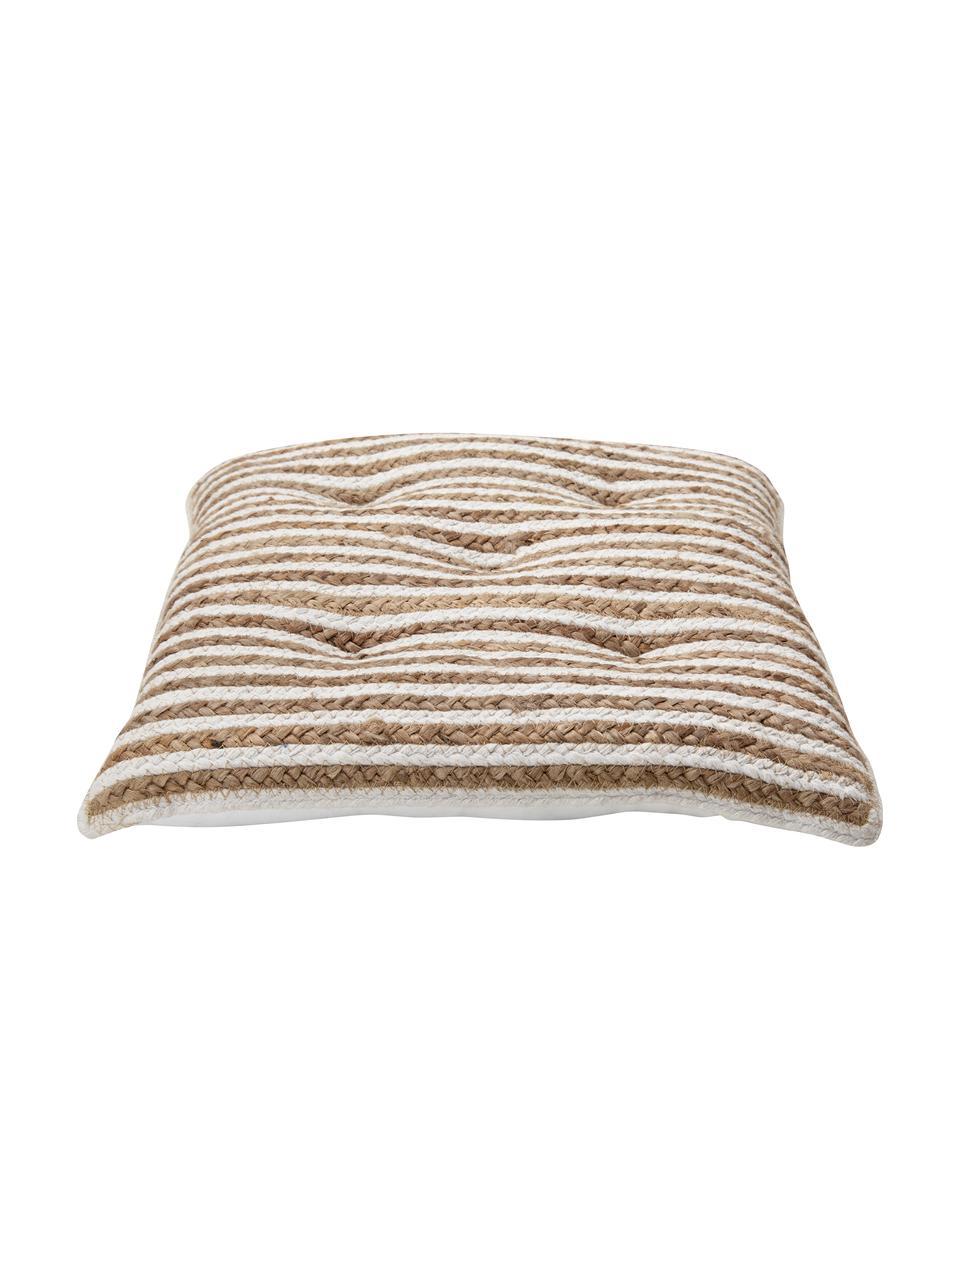 Juten stoelkussen Faeka, Bovenzijde: jute, katoen, Onderzijde: 100% katoen, Beige, wit, 40 x 40 cm